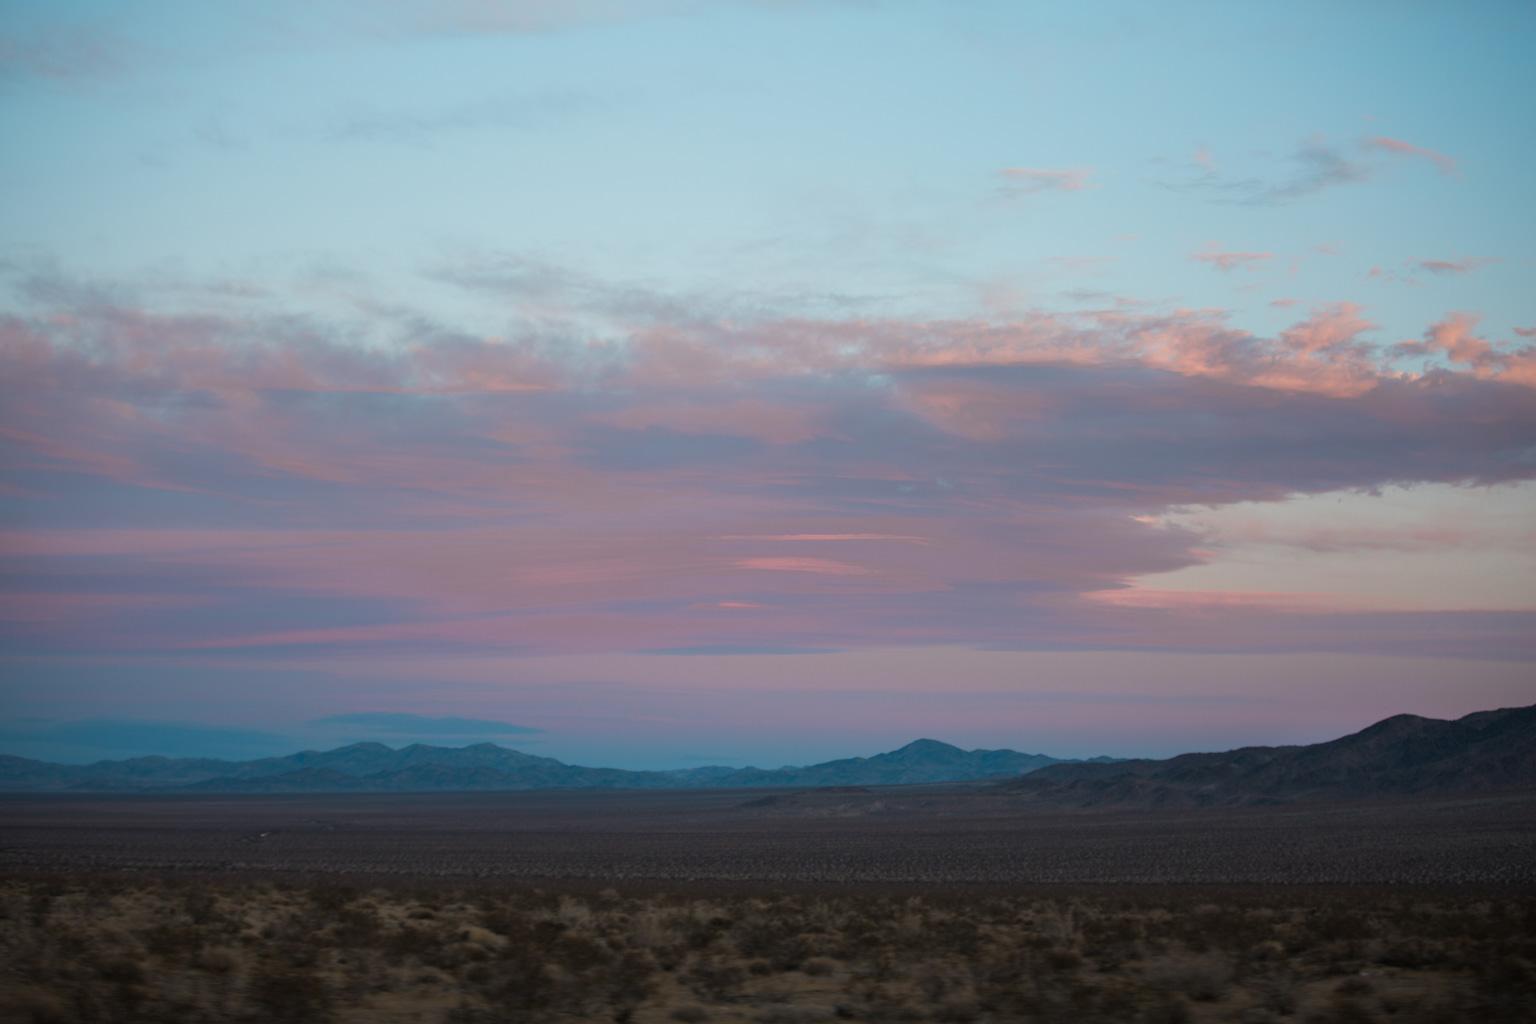 CindyGiovagnoli_Joshua_Tree_National_Park_California_Mojave_Desert_Cholla_Garden_Hidden_Valley_climbing_hiking_camping-015.jpg